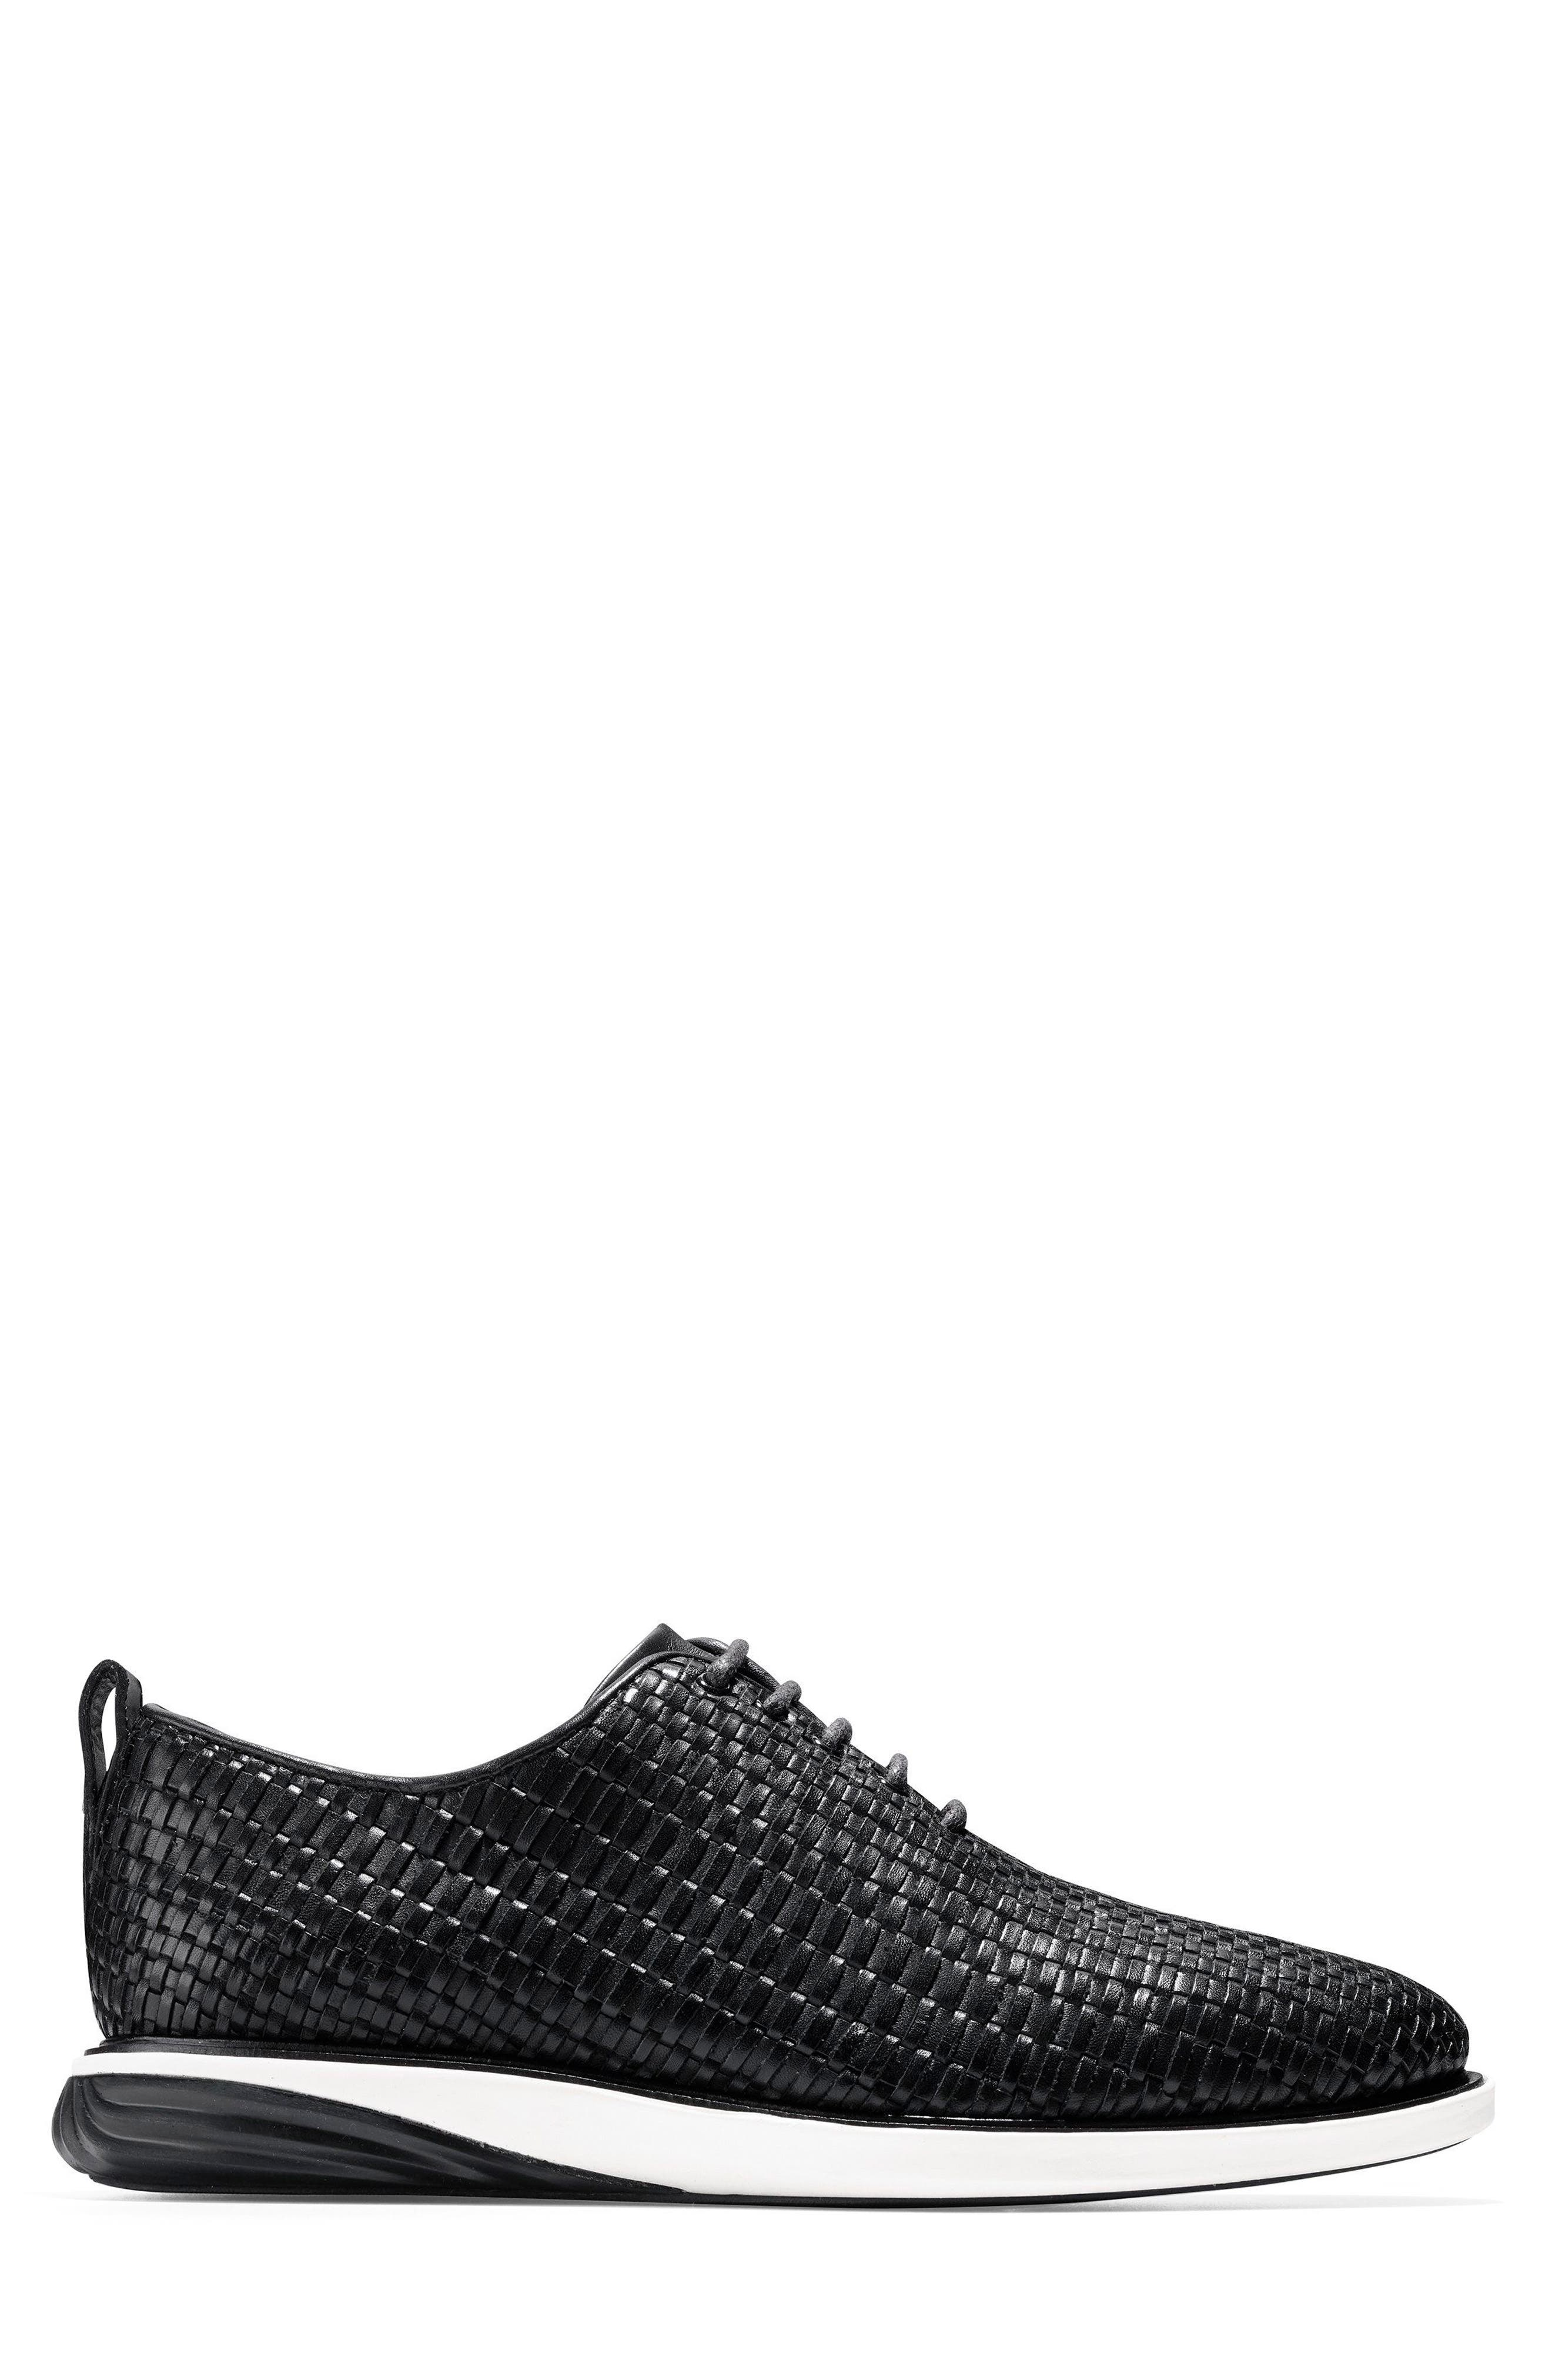 Grand Evolution Woven Oxford,                             Alternate thumbnail 3, color,                             Black Leather